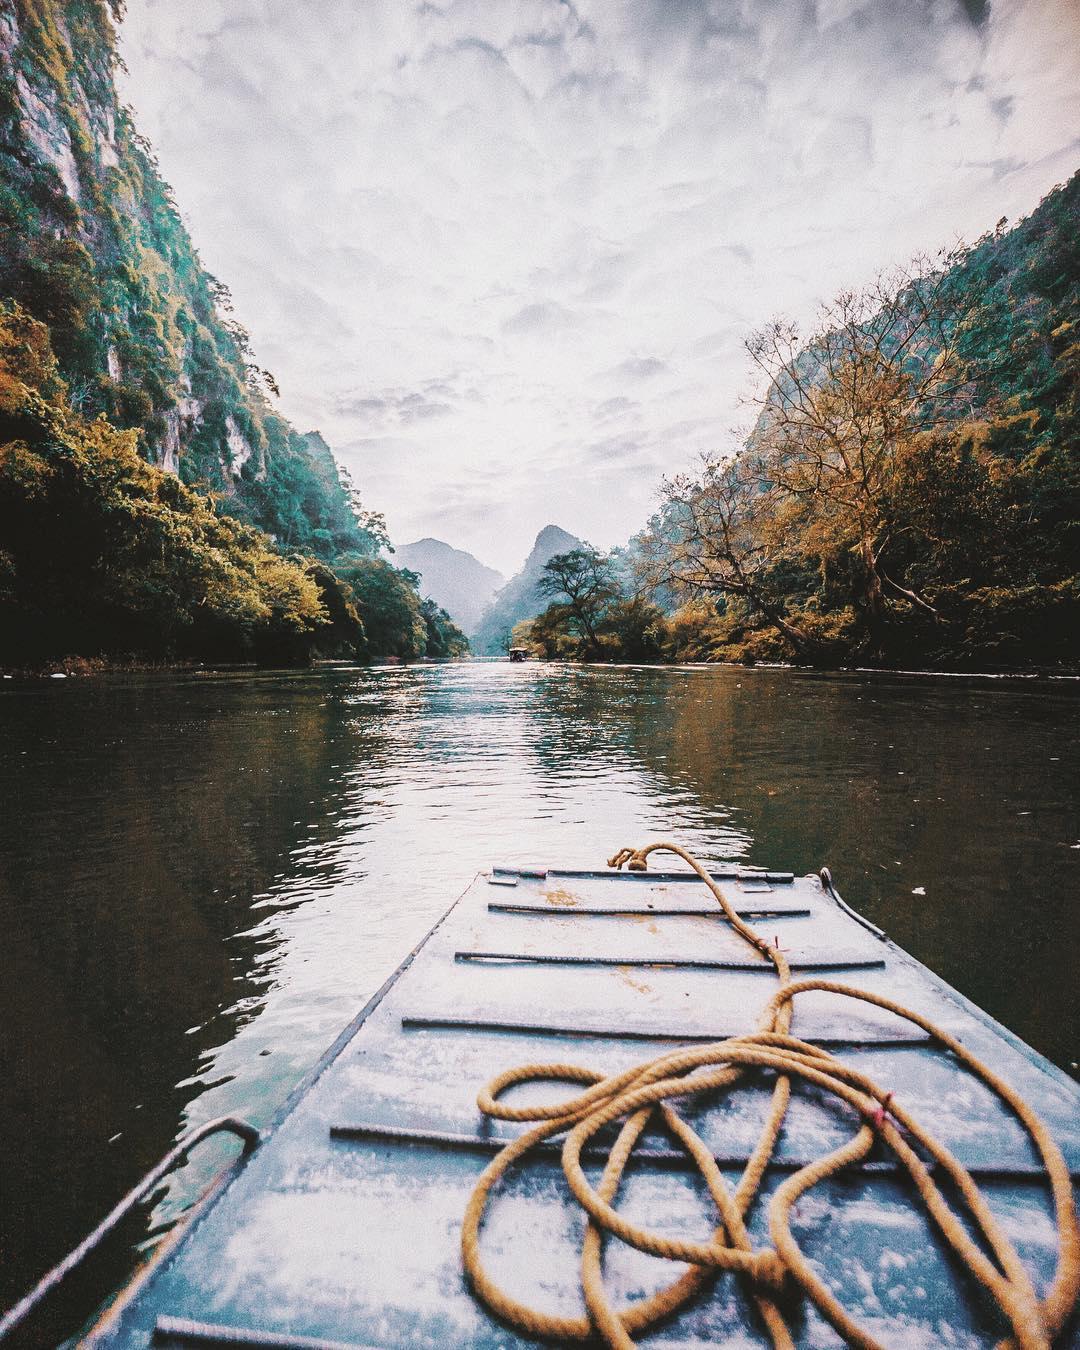 Boat, Vietnam, 2017.